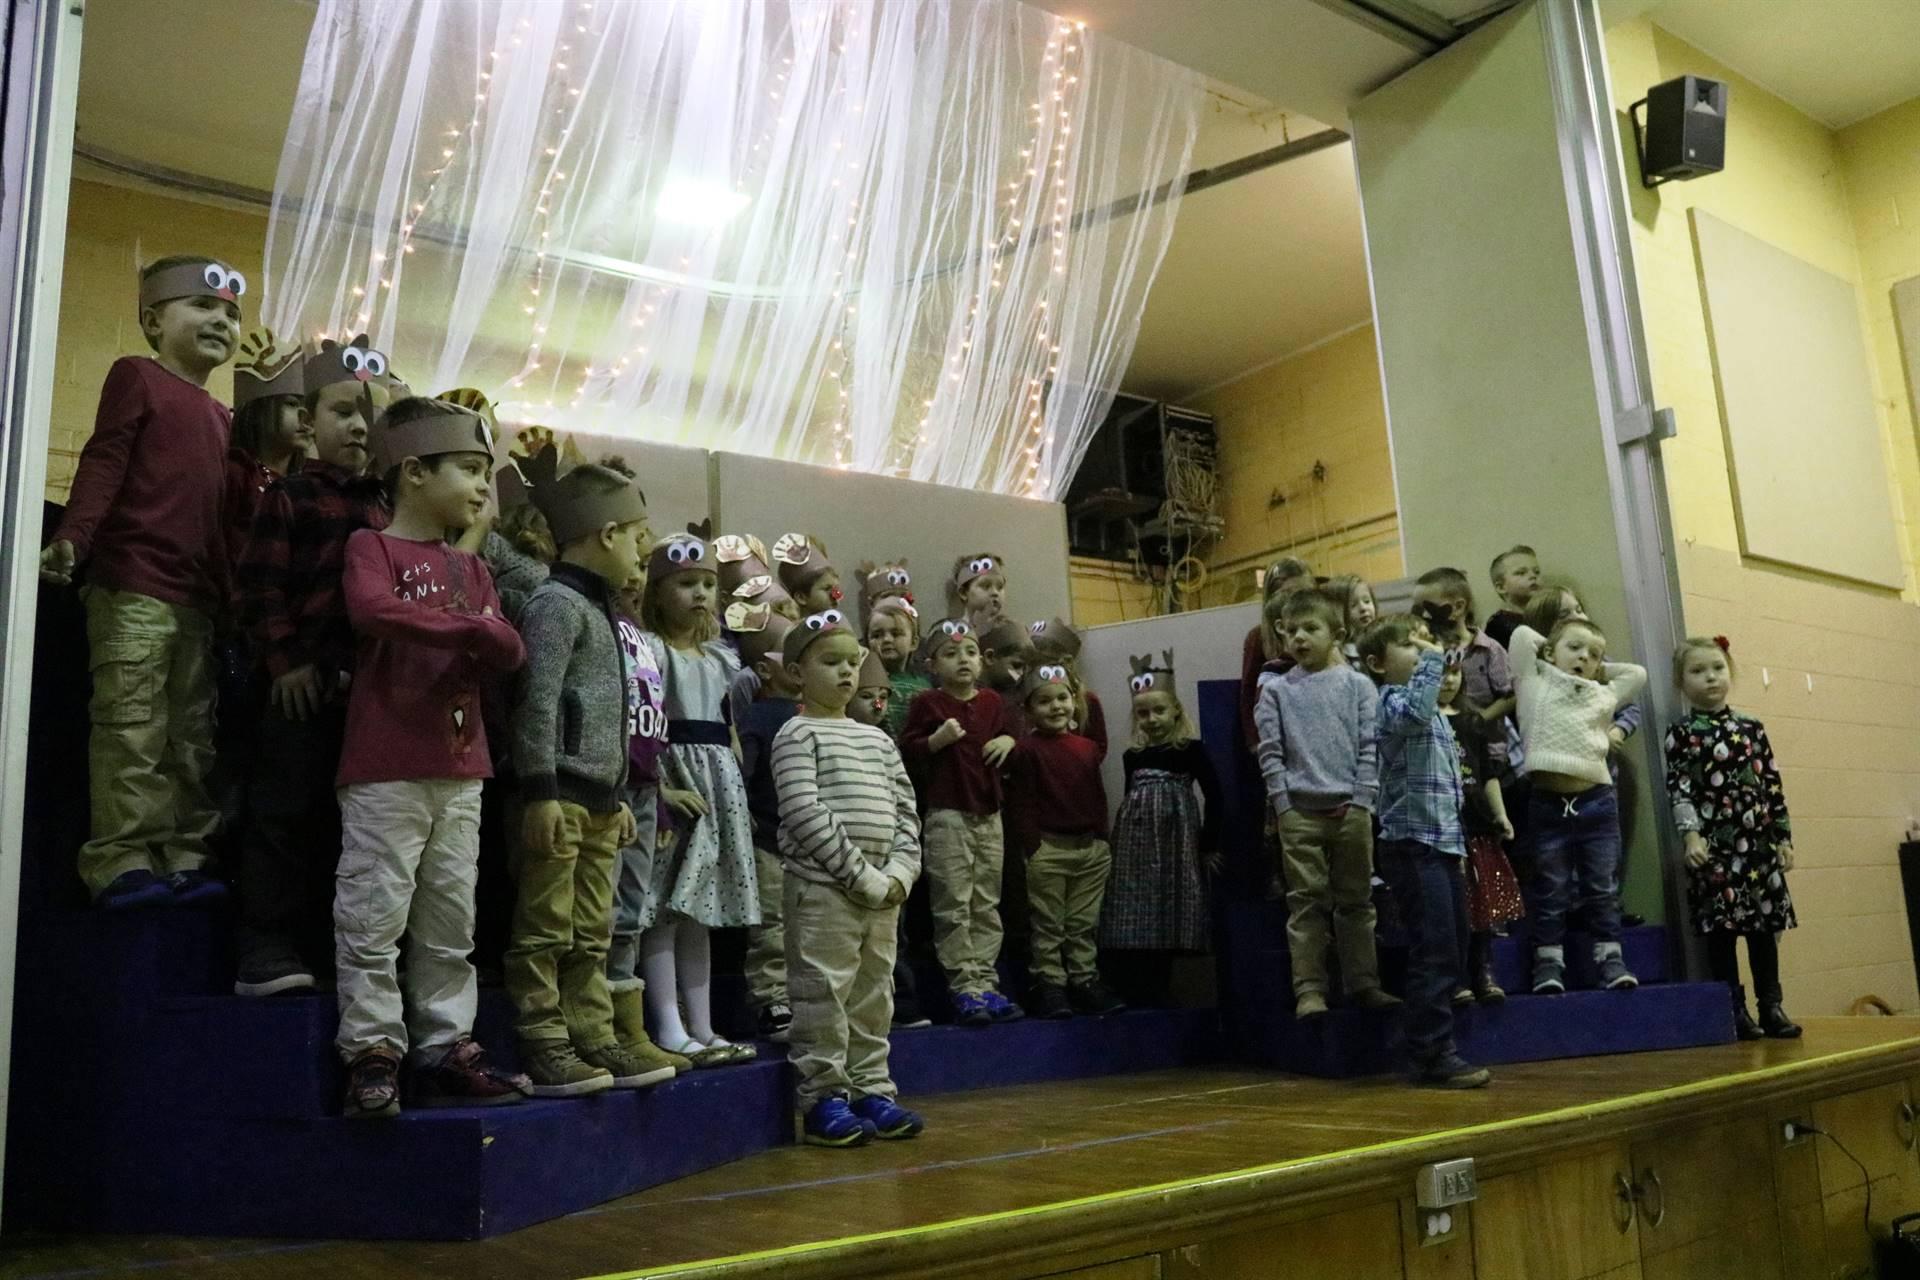 group of preschoolers singing on stage